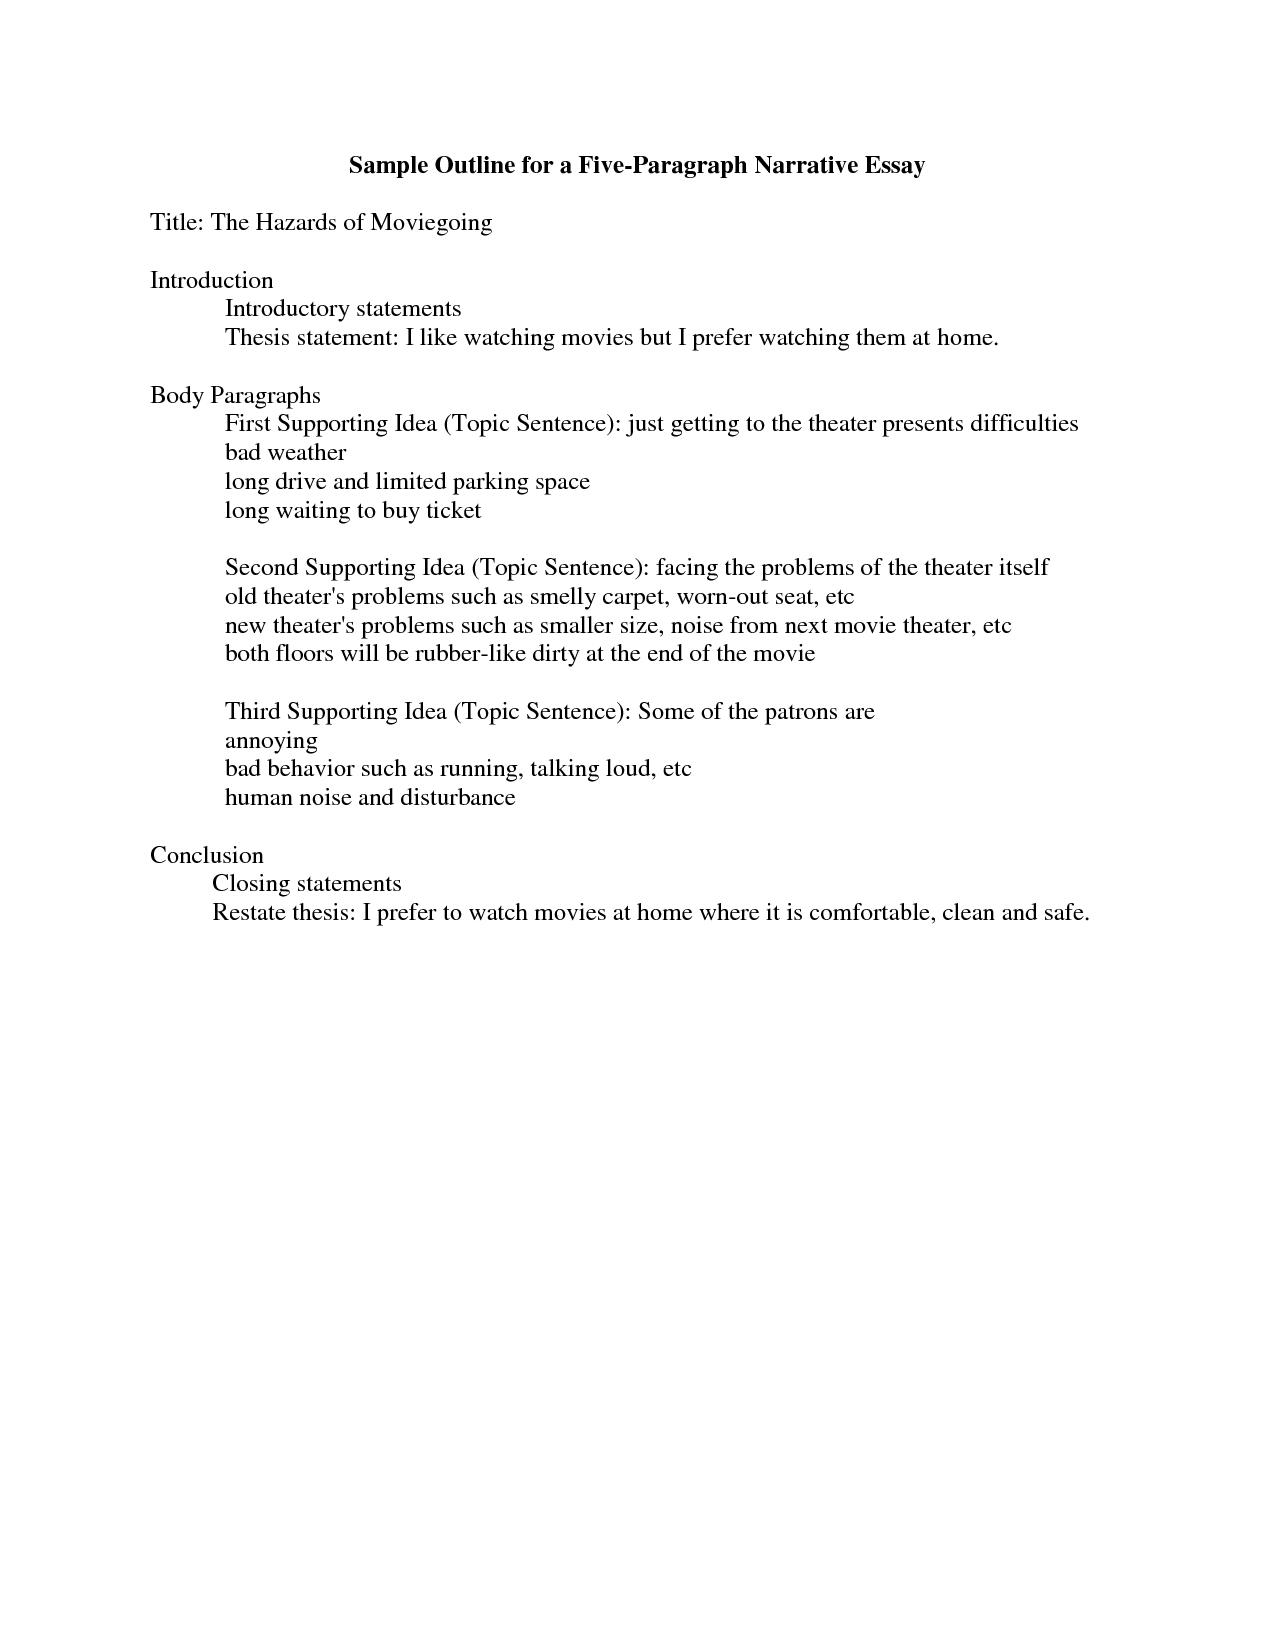 003 Narrative Essay Outline Impressive Template Paper Example Doc Full